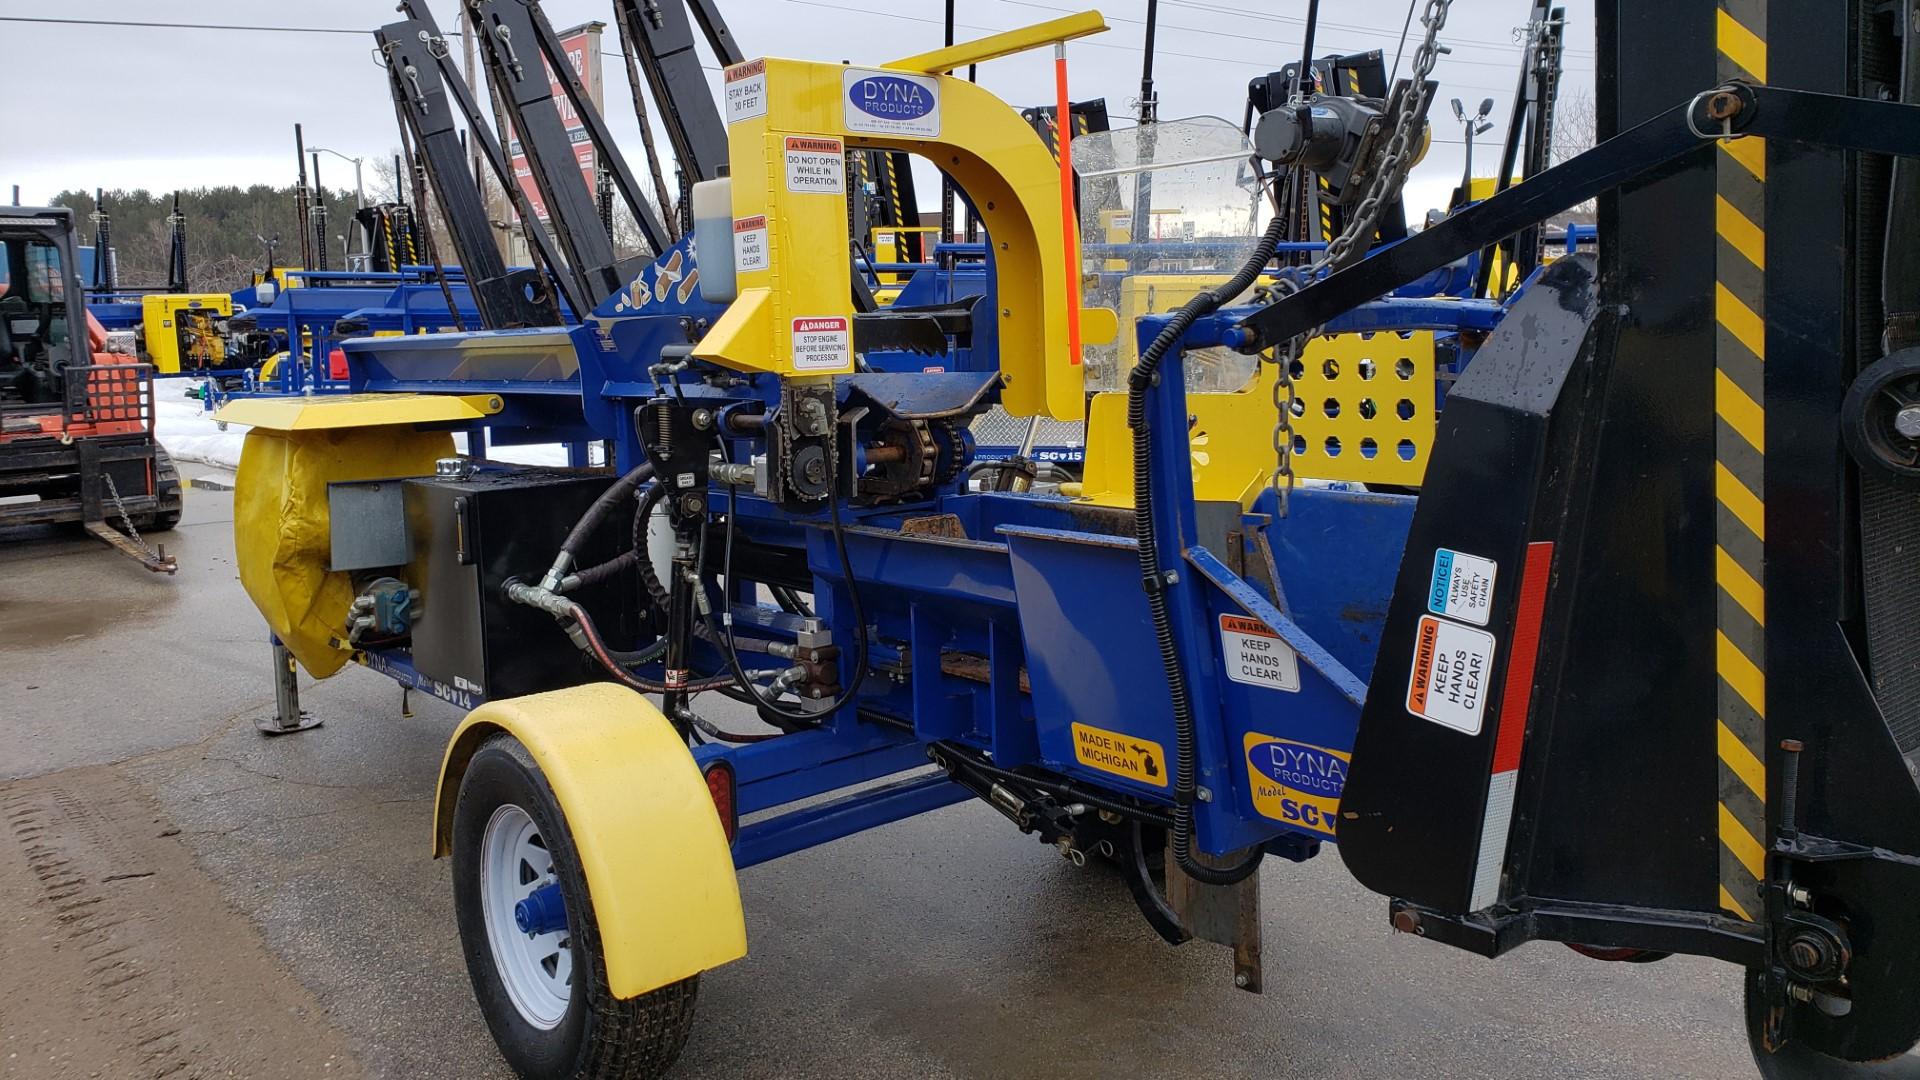 Used DYNA 2018 SC-14 Kohler GasFirewood Processor